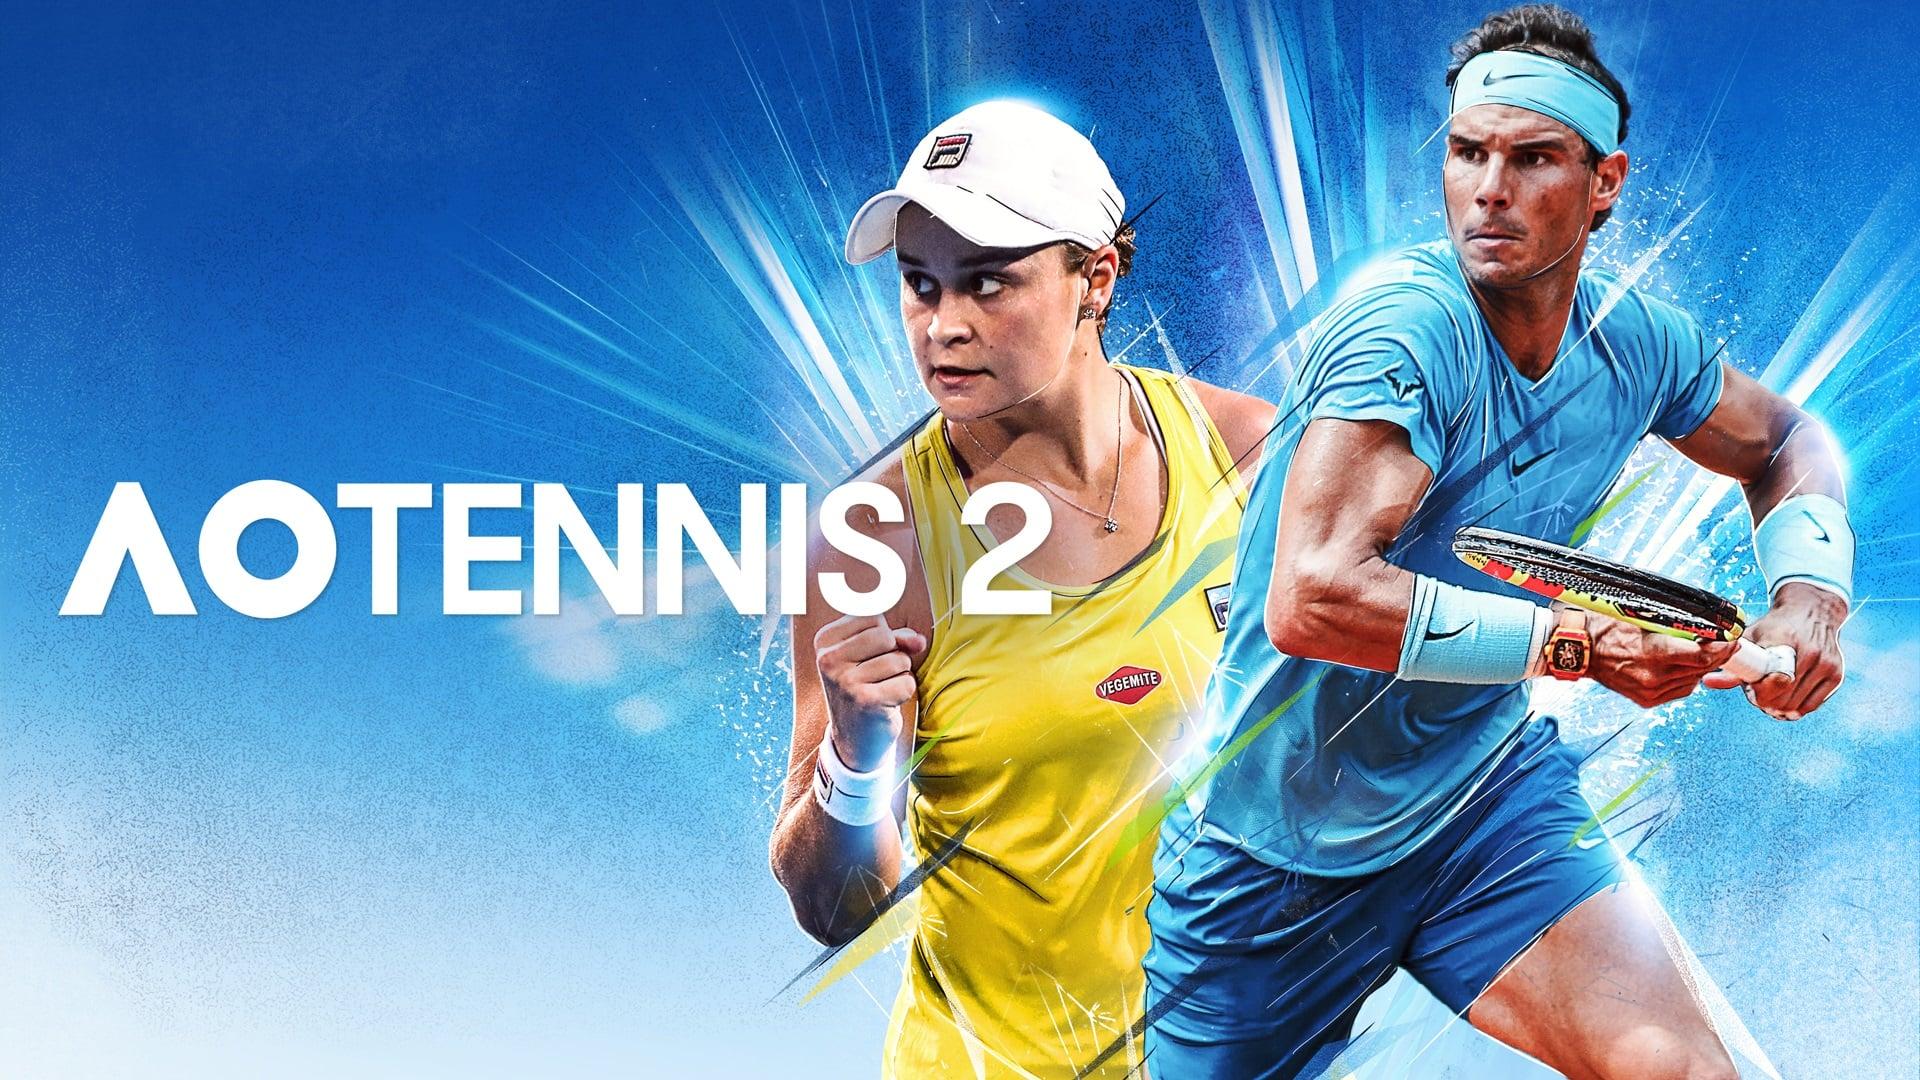 AO Tennis 2 Achievements